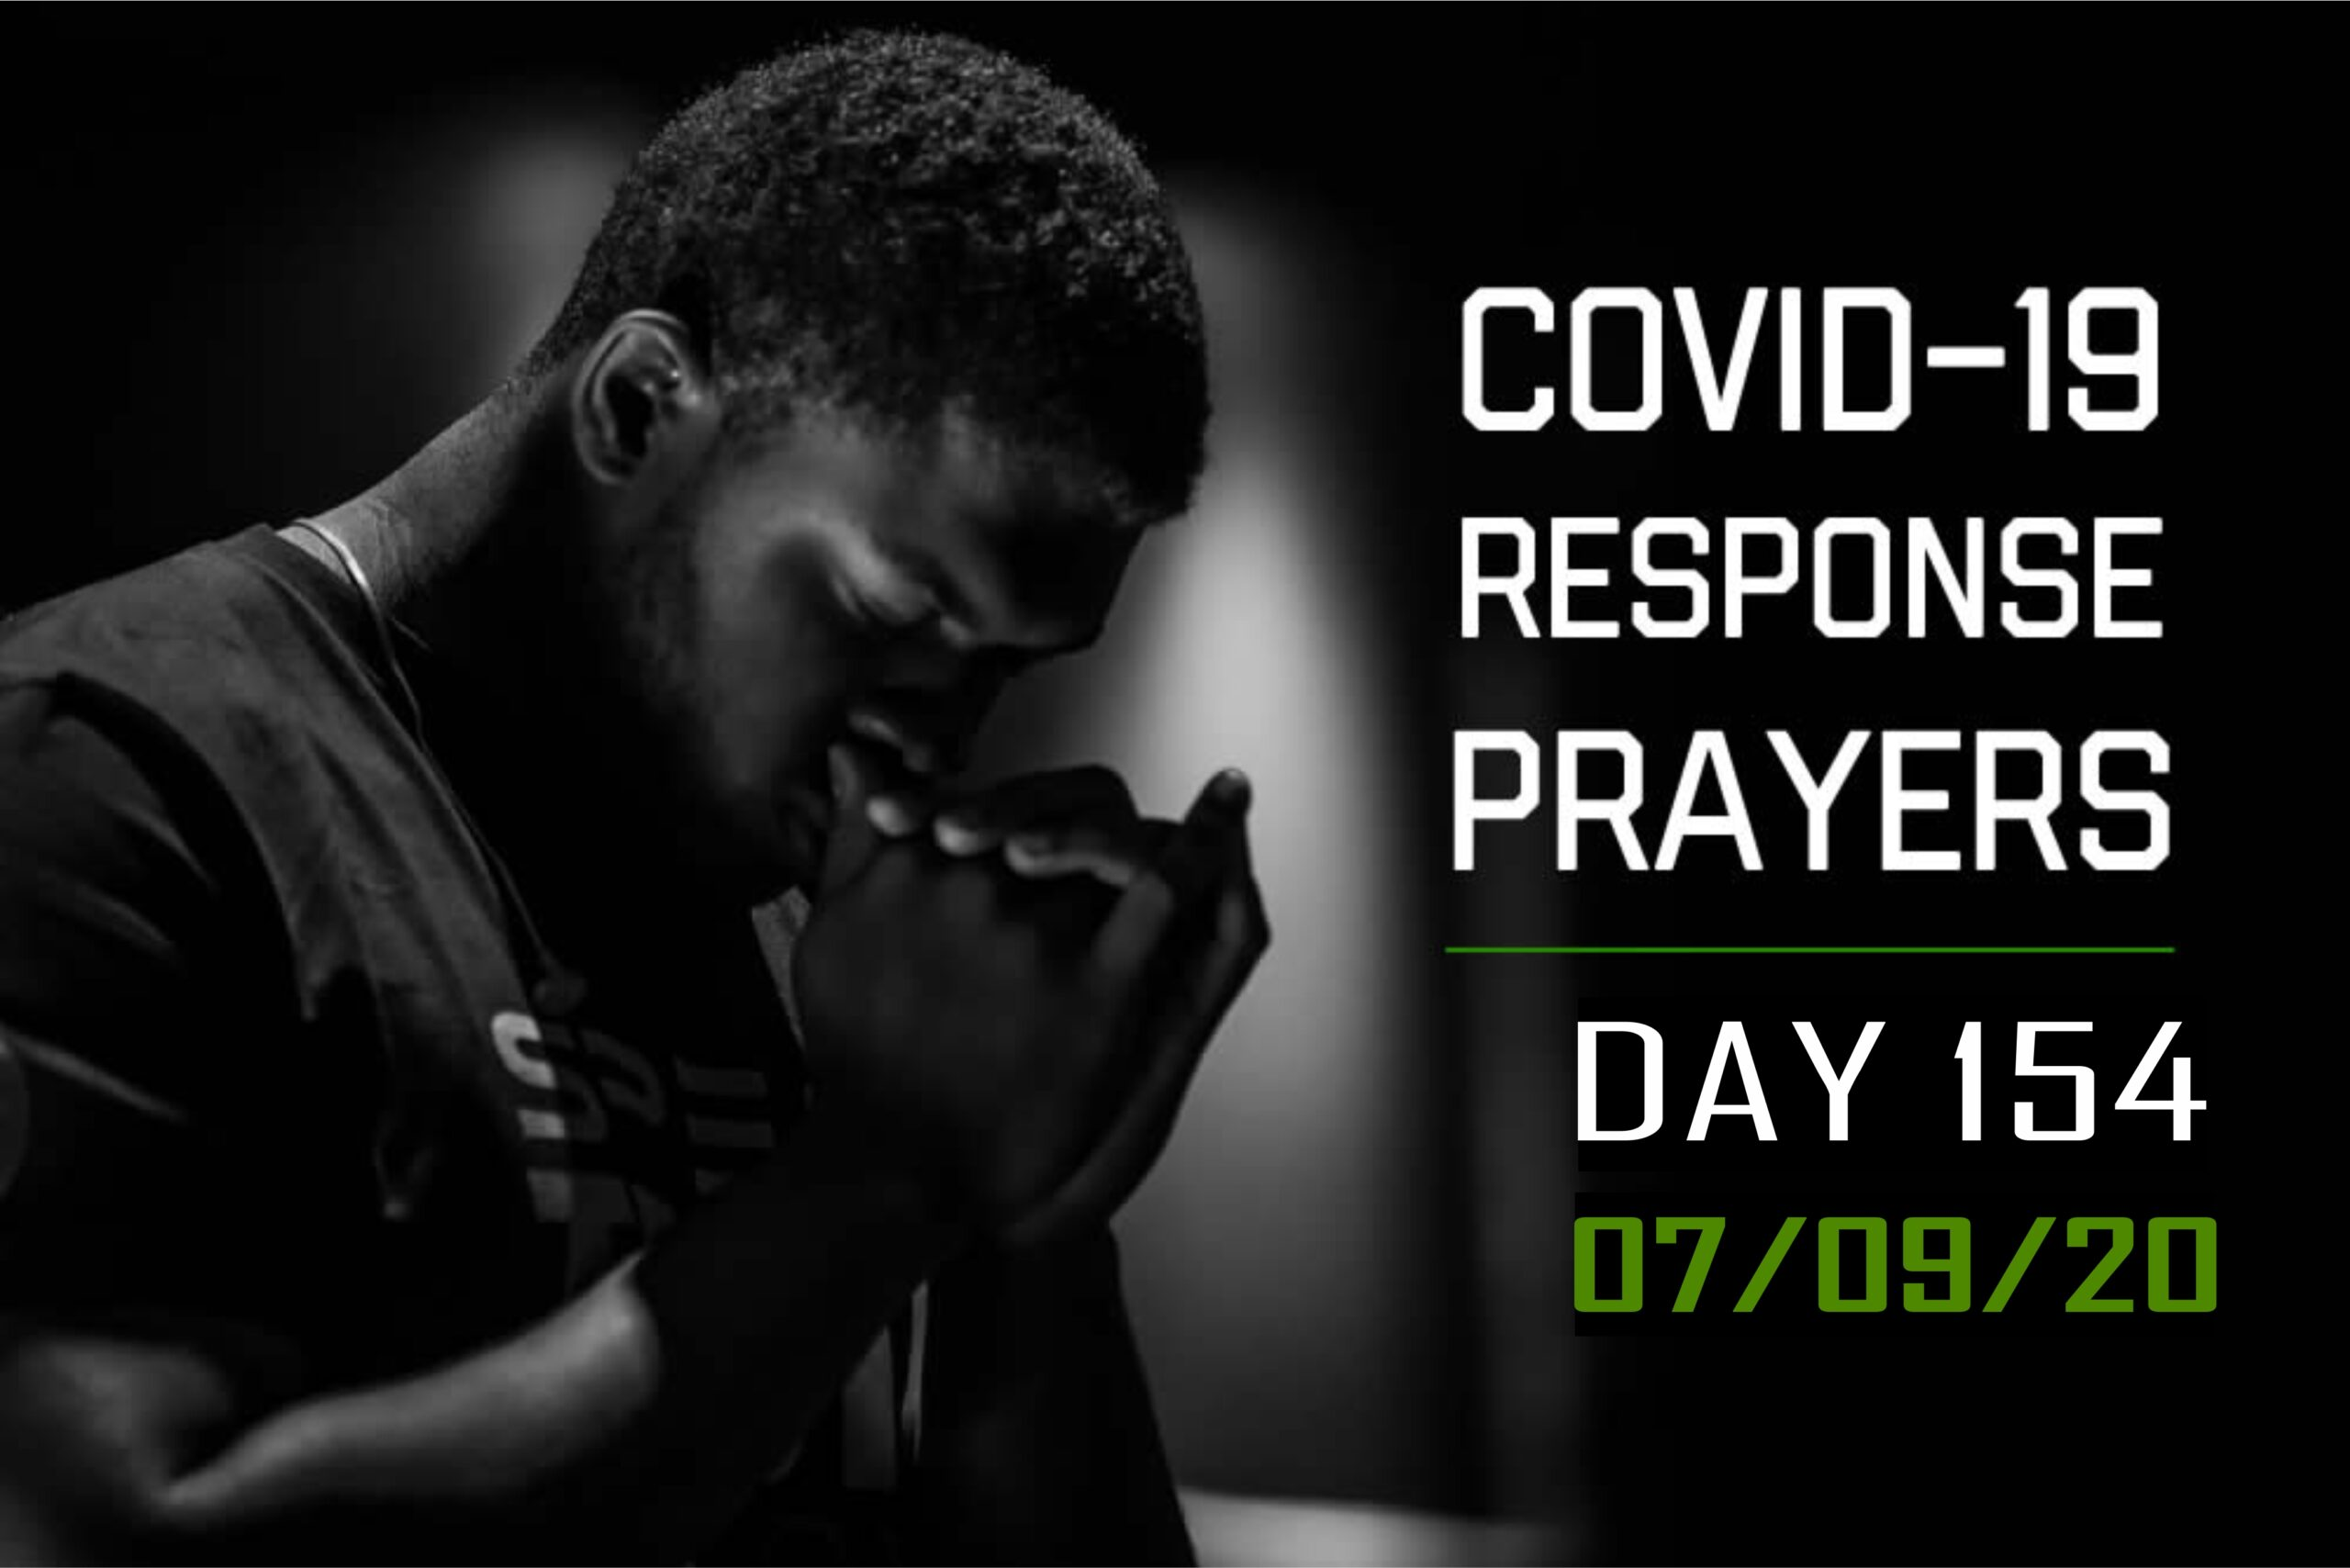 COVID-19 Response Prayers Day – 154